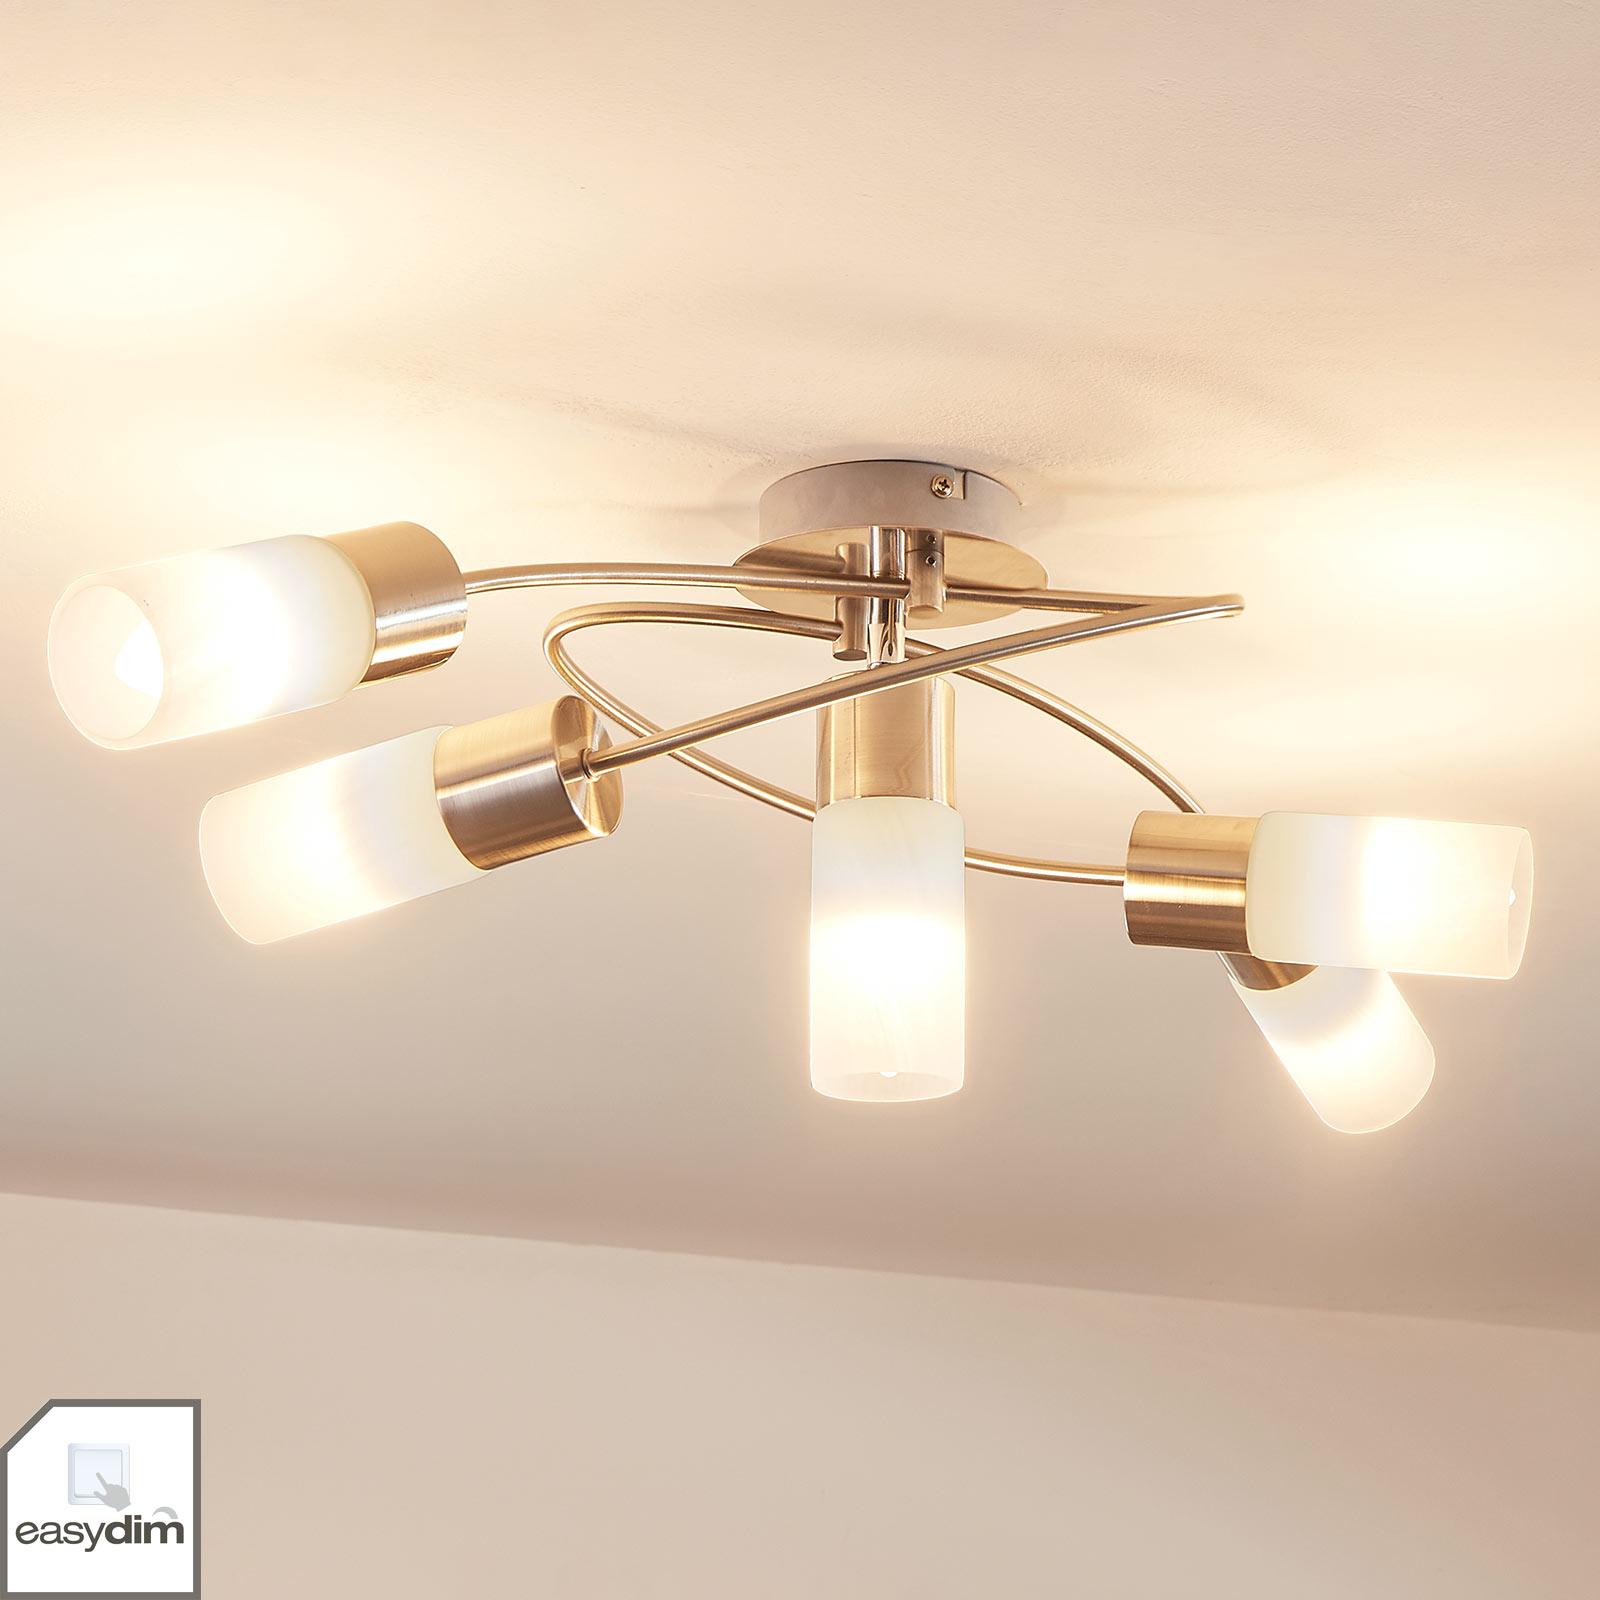 5-punktowa lampa sufitowa LED Erva, ściemniana